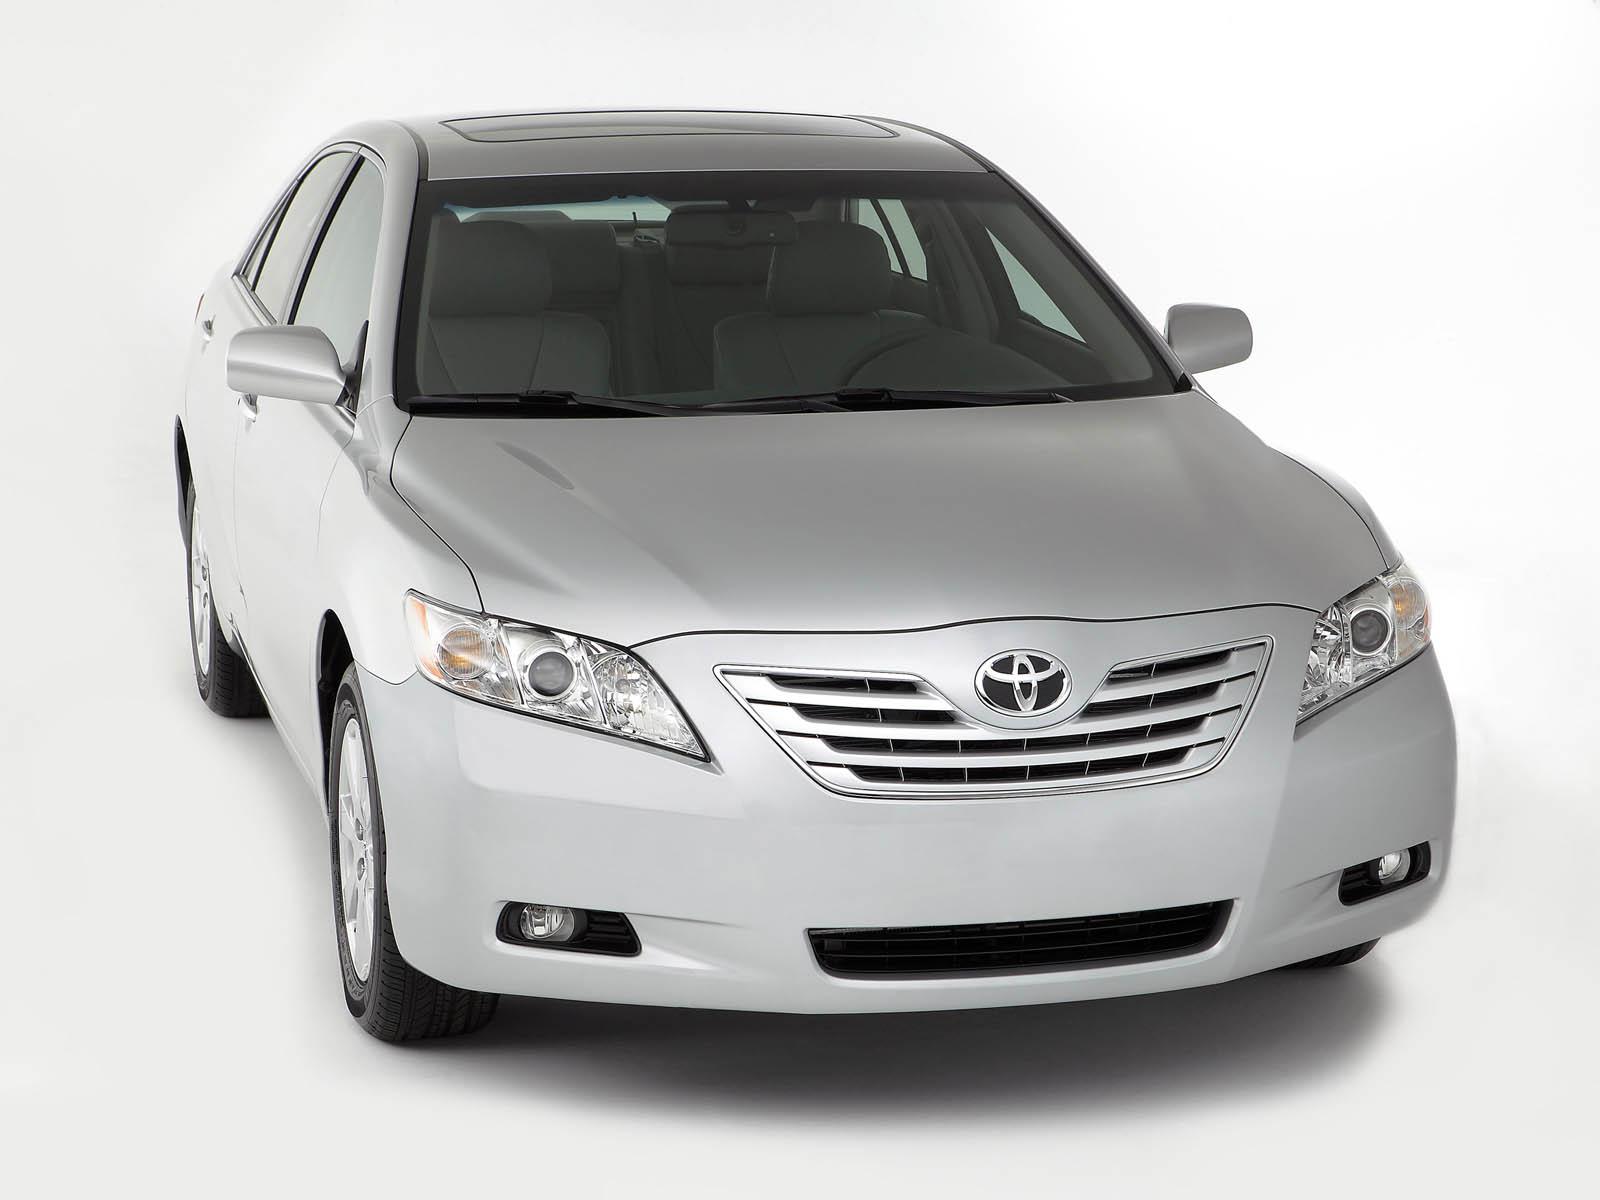 Toyota Camry 2012 2019 2020 Top Car Models John Deere Mower Belt Diagram Hd Walls Find Wallpapers